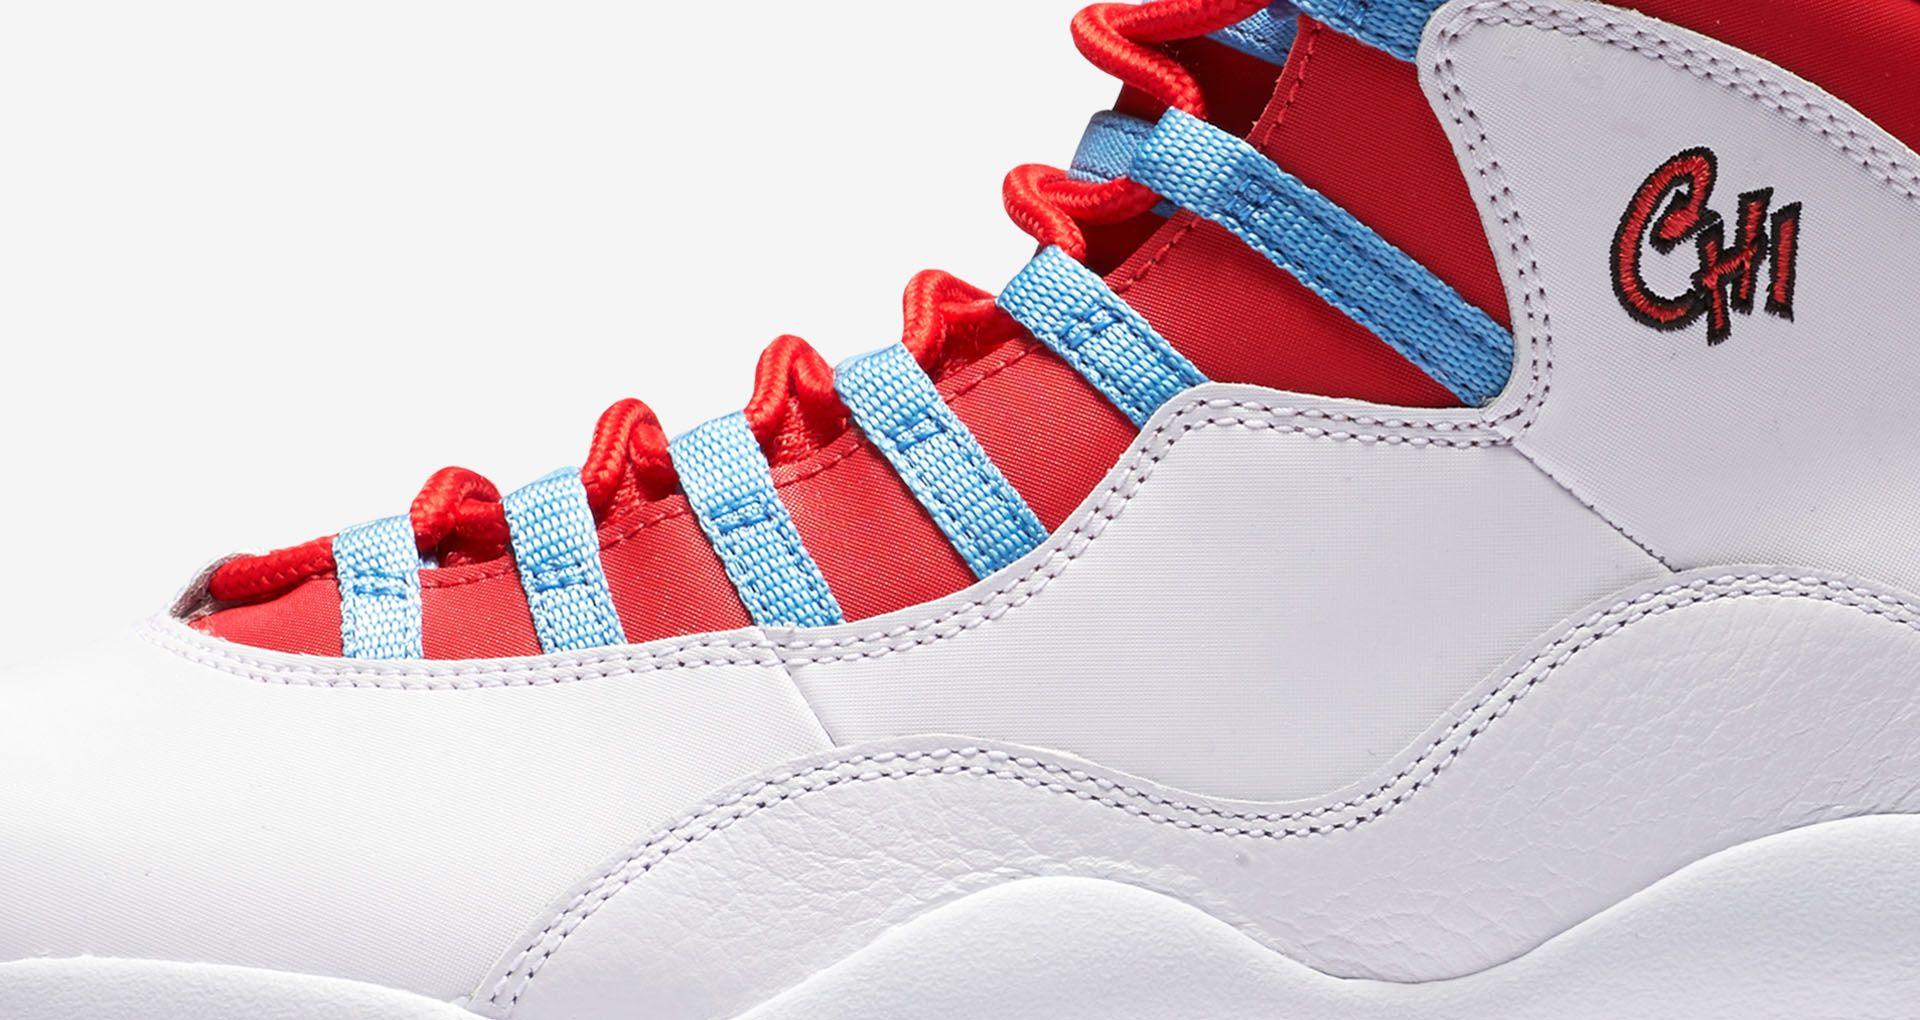 737cfedd8dd667 Air Jordan 10 Retro  Chicago  Release Date. Nike+ SNKRS